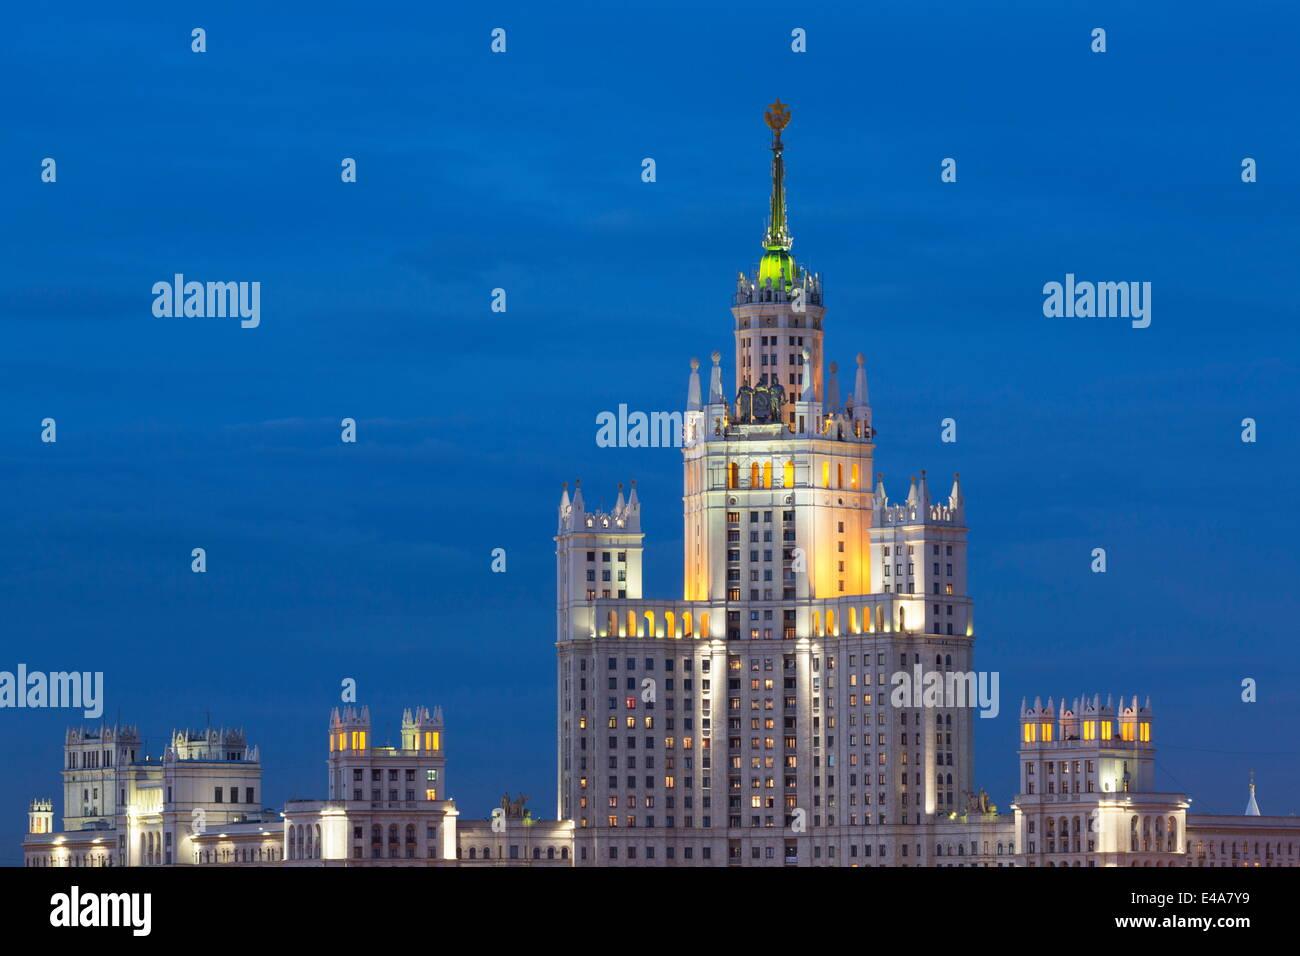 Horizonte de Moscú en la noche con Stalanist-Gothic rascacielos, Moscú, Rusia, Europa Imagen De Stock